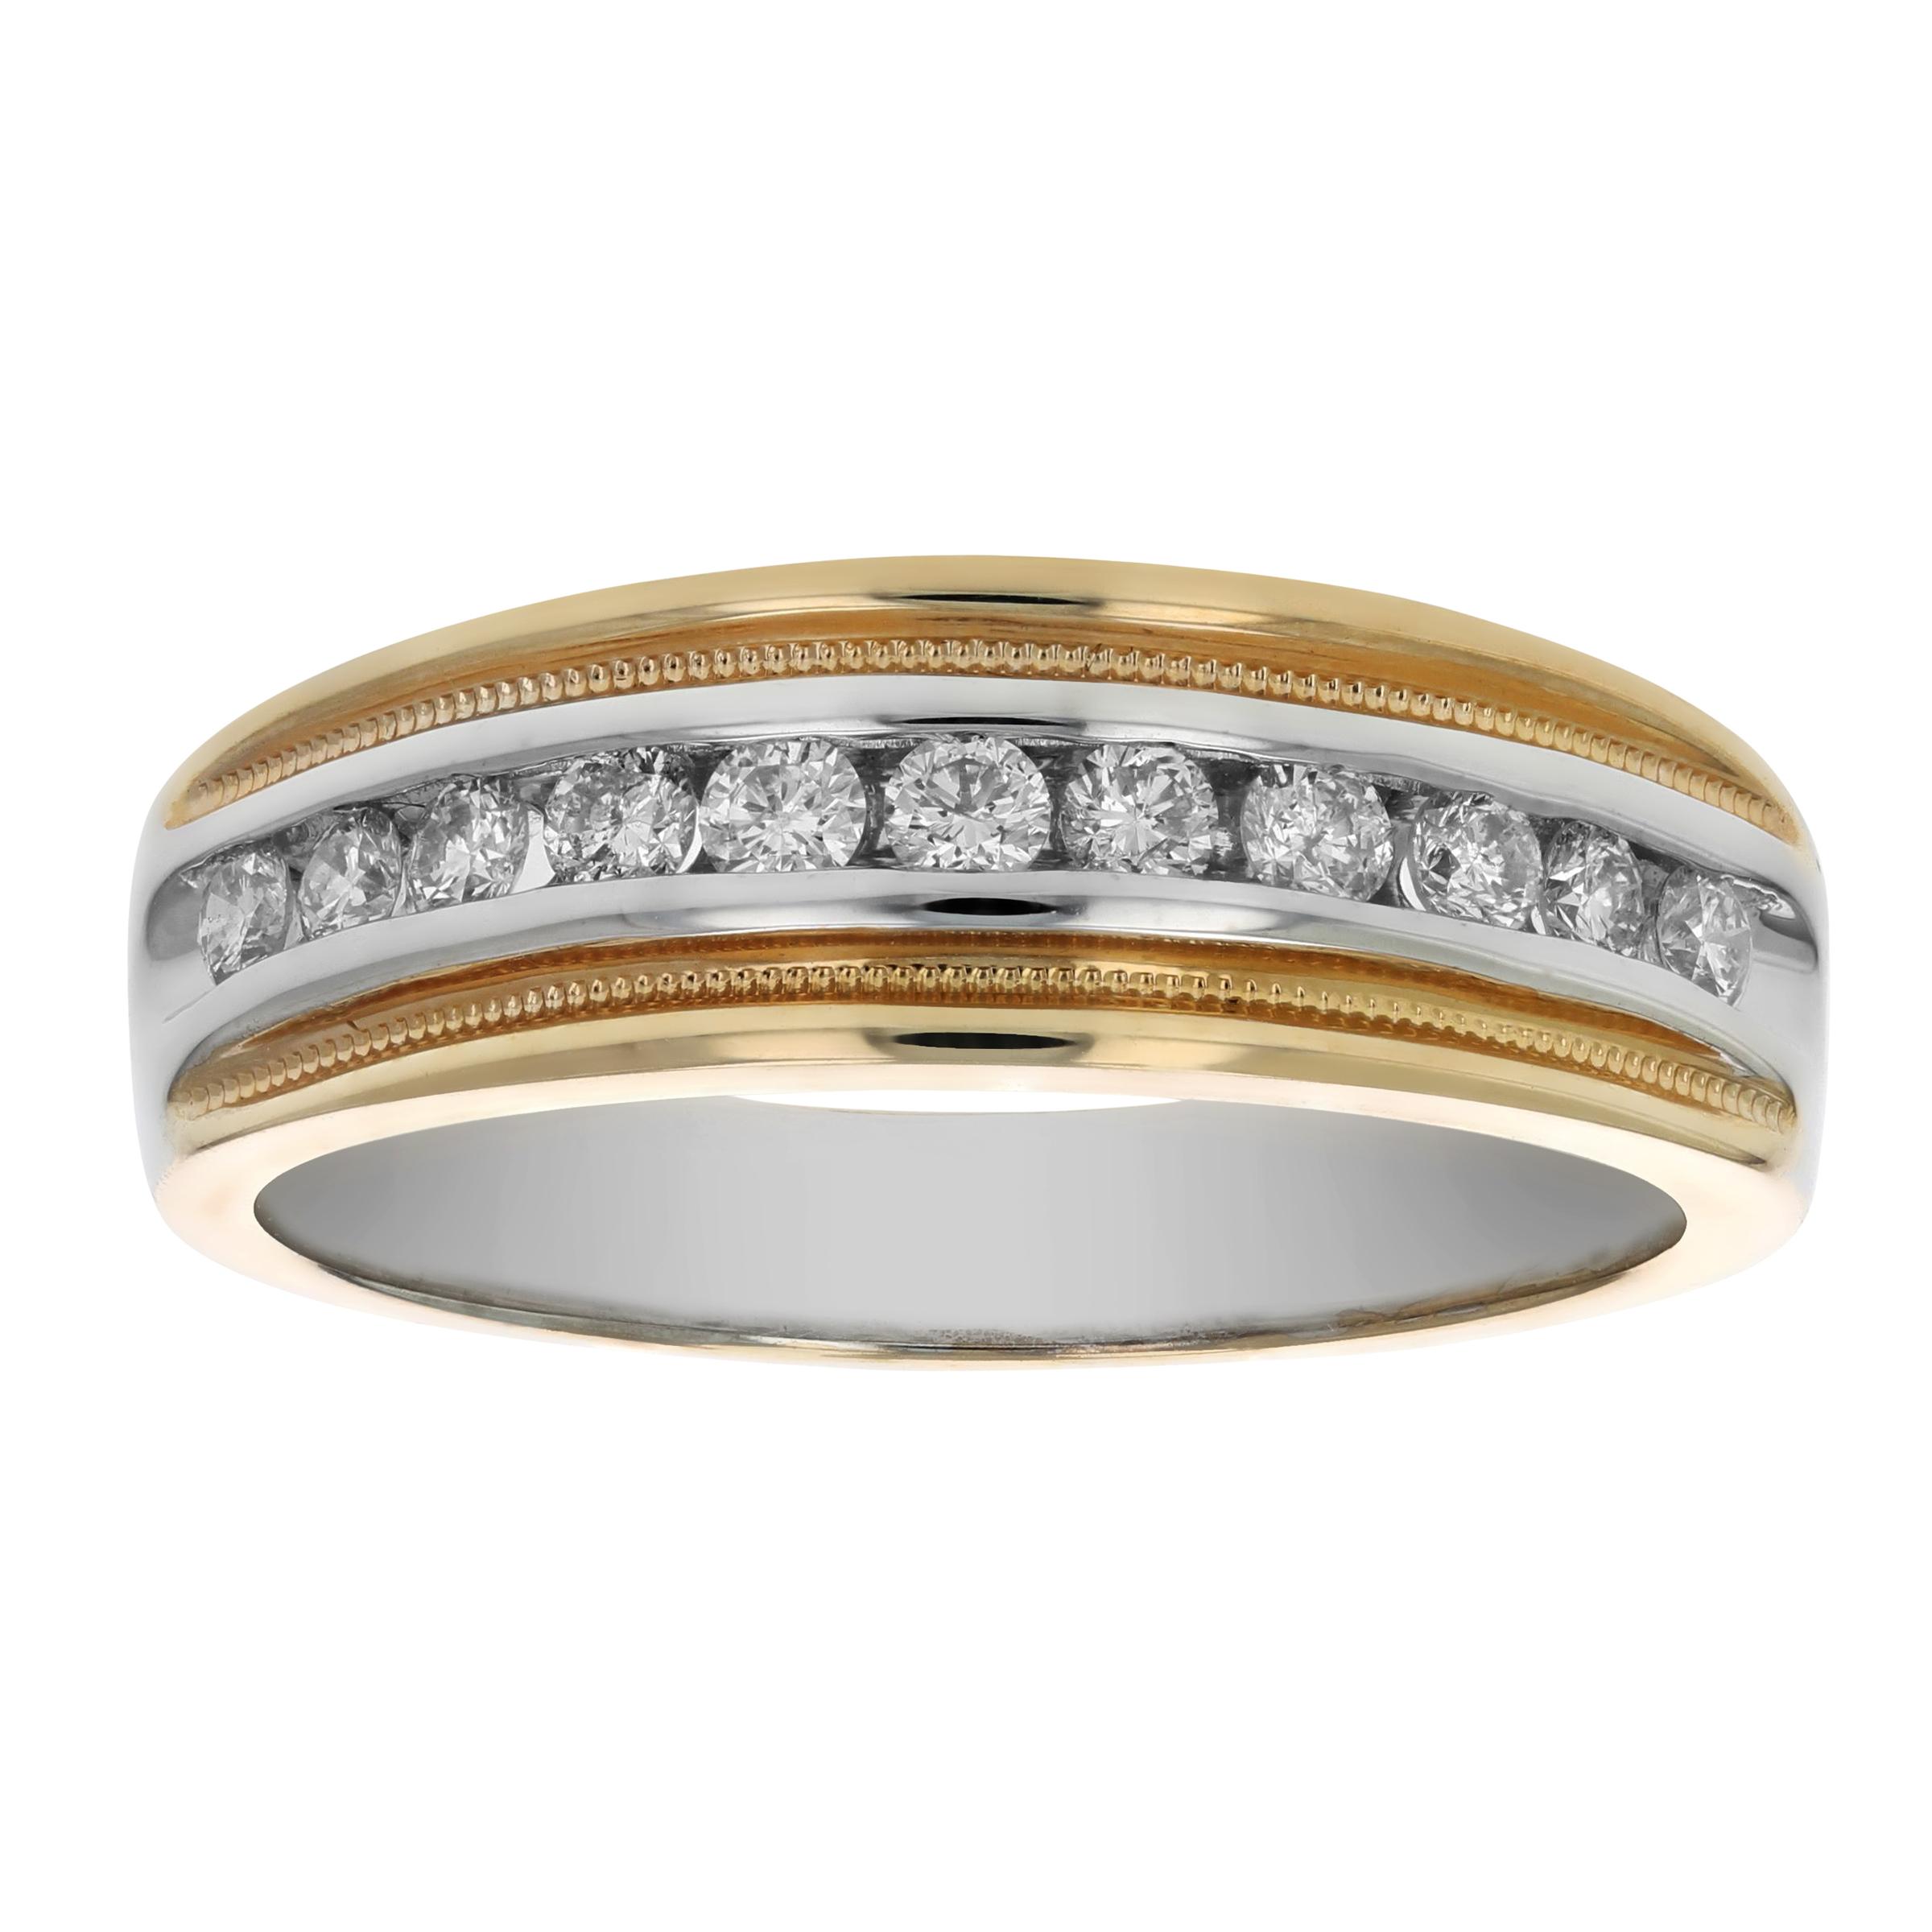 2f748c50fe 1/2 CT Men's Diamond Wedding Band 14K White and Yellow Gold Size 10 ...